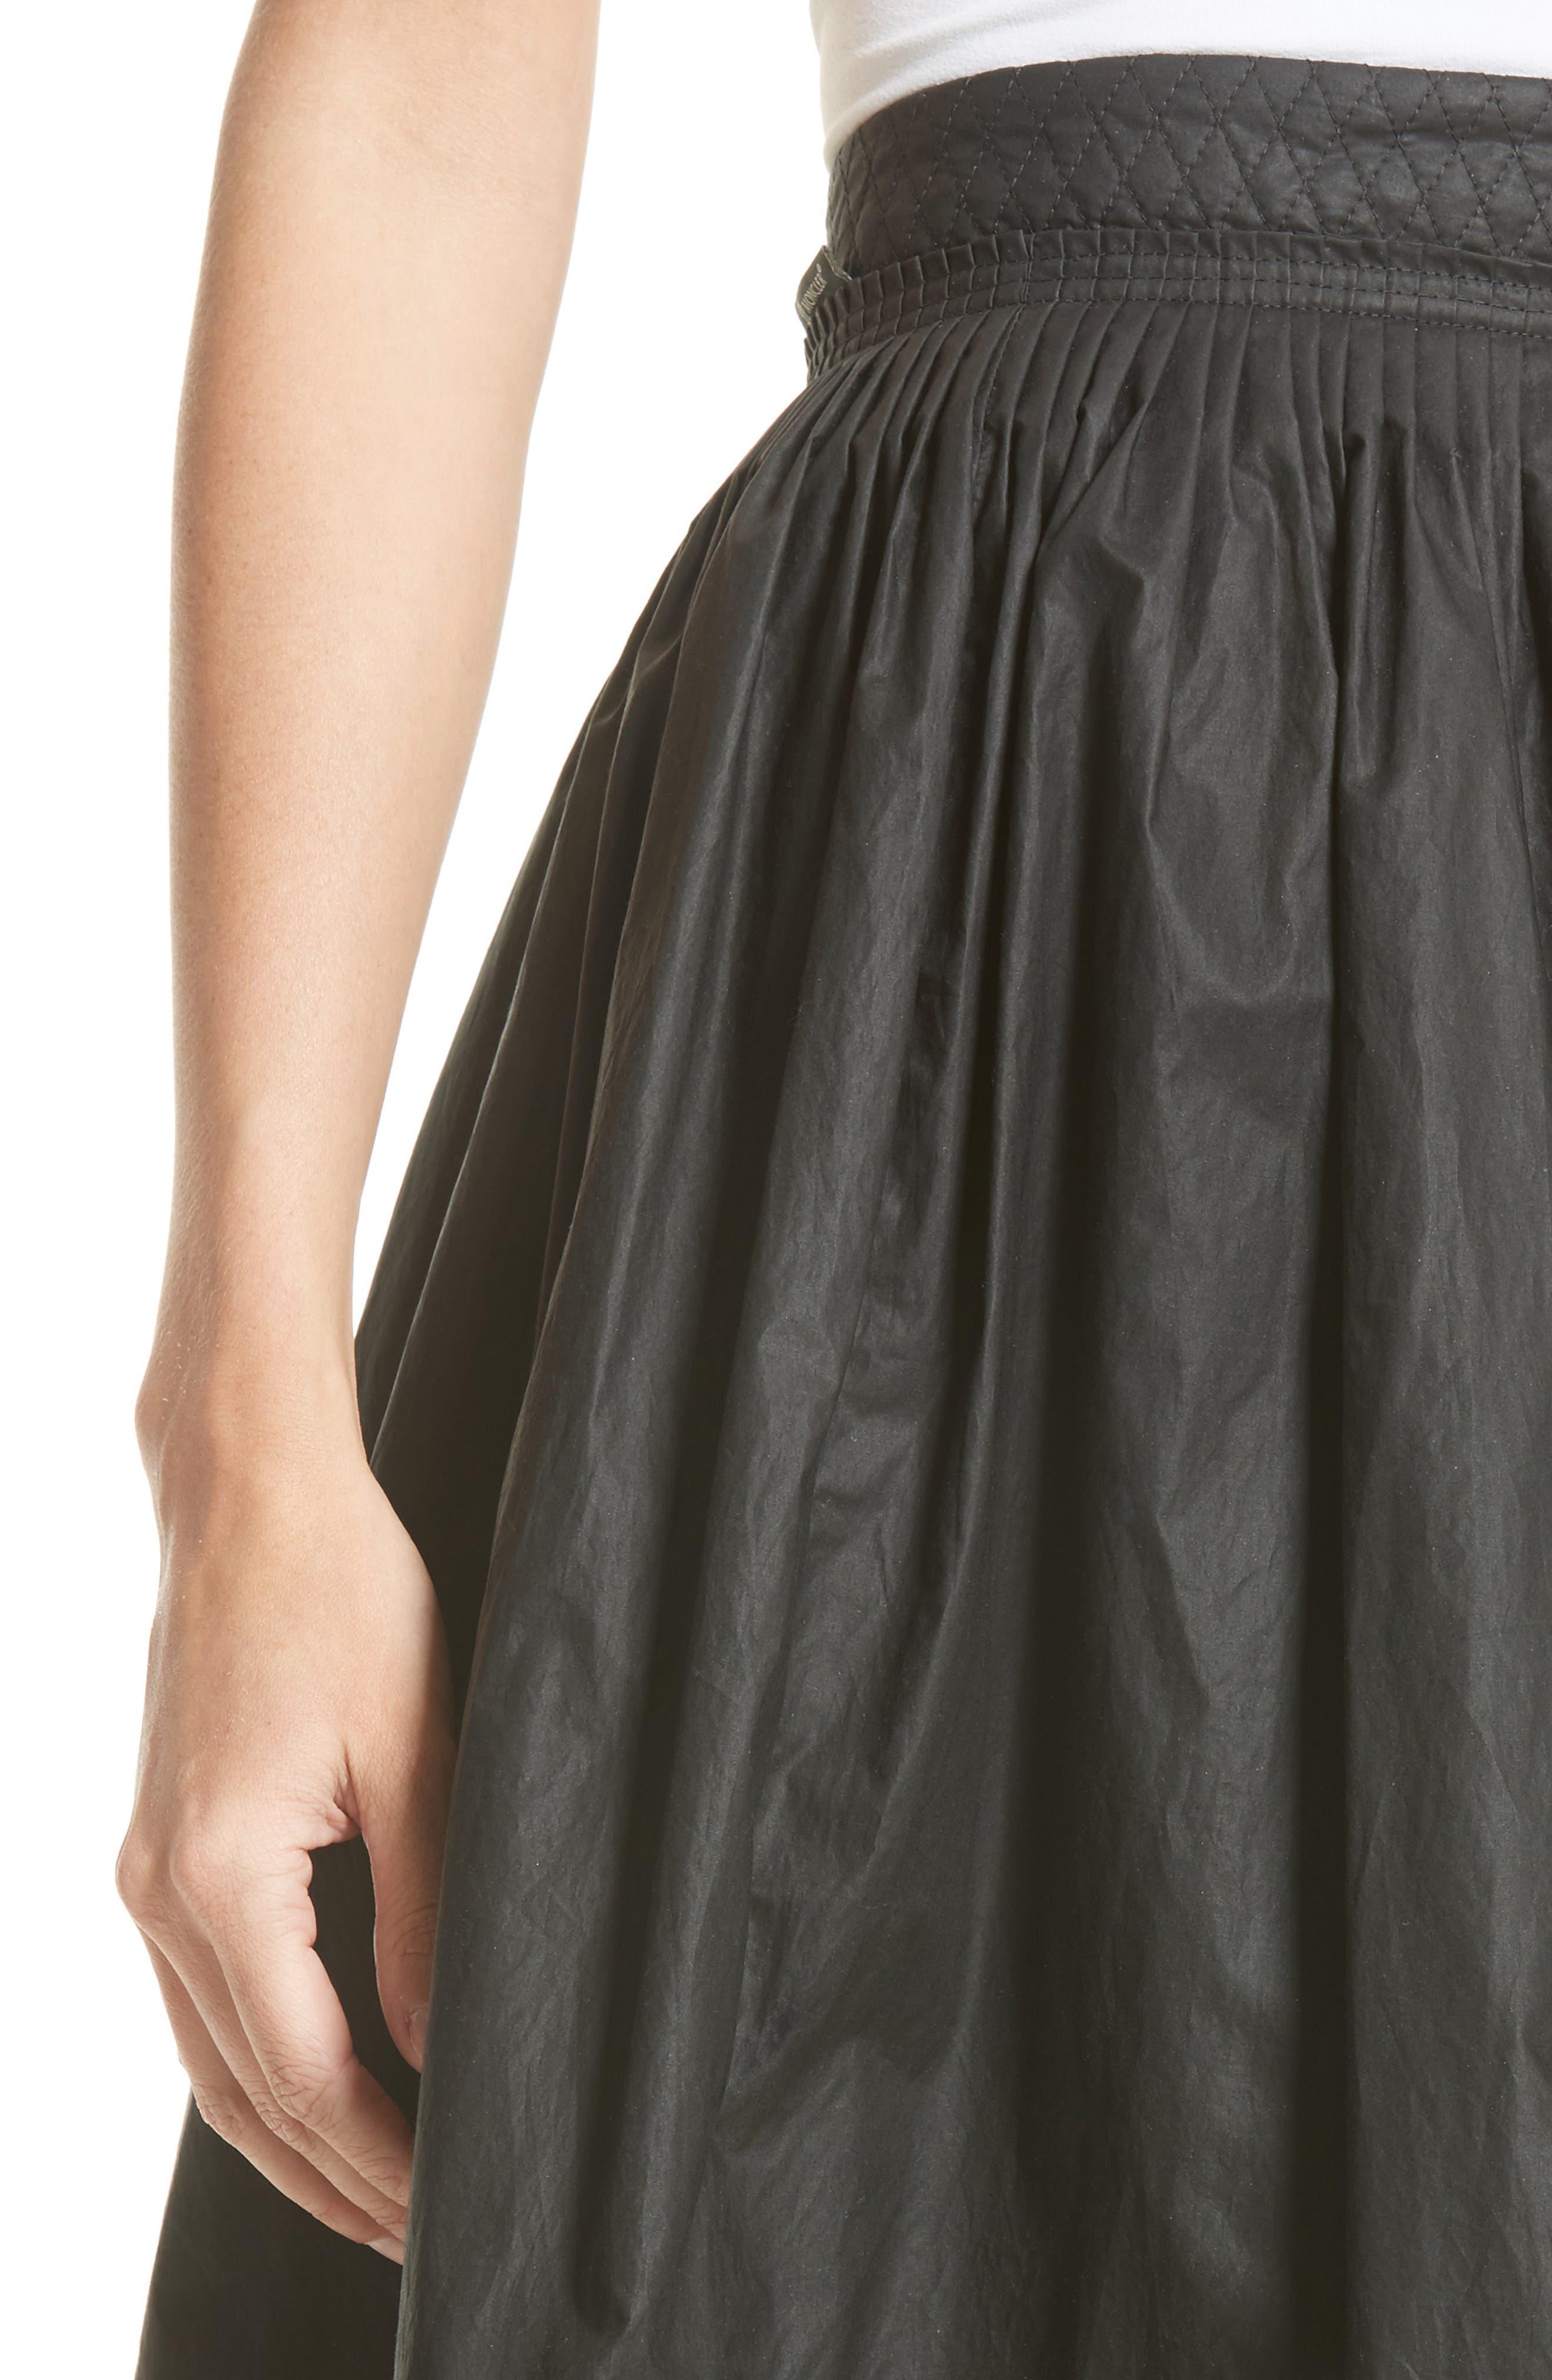 Gonna Cotton A-Line Skirt,                             Alternate thumbnail 4, color,